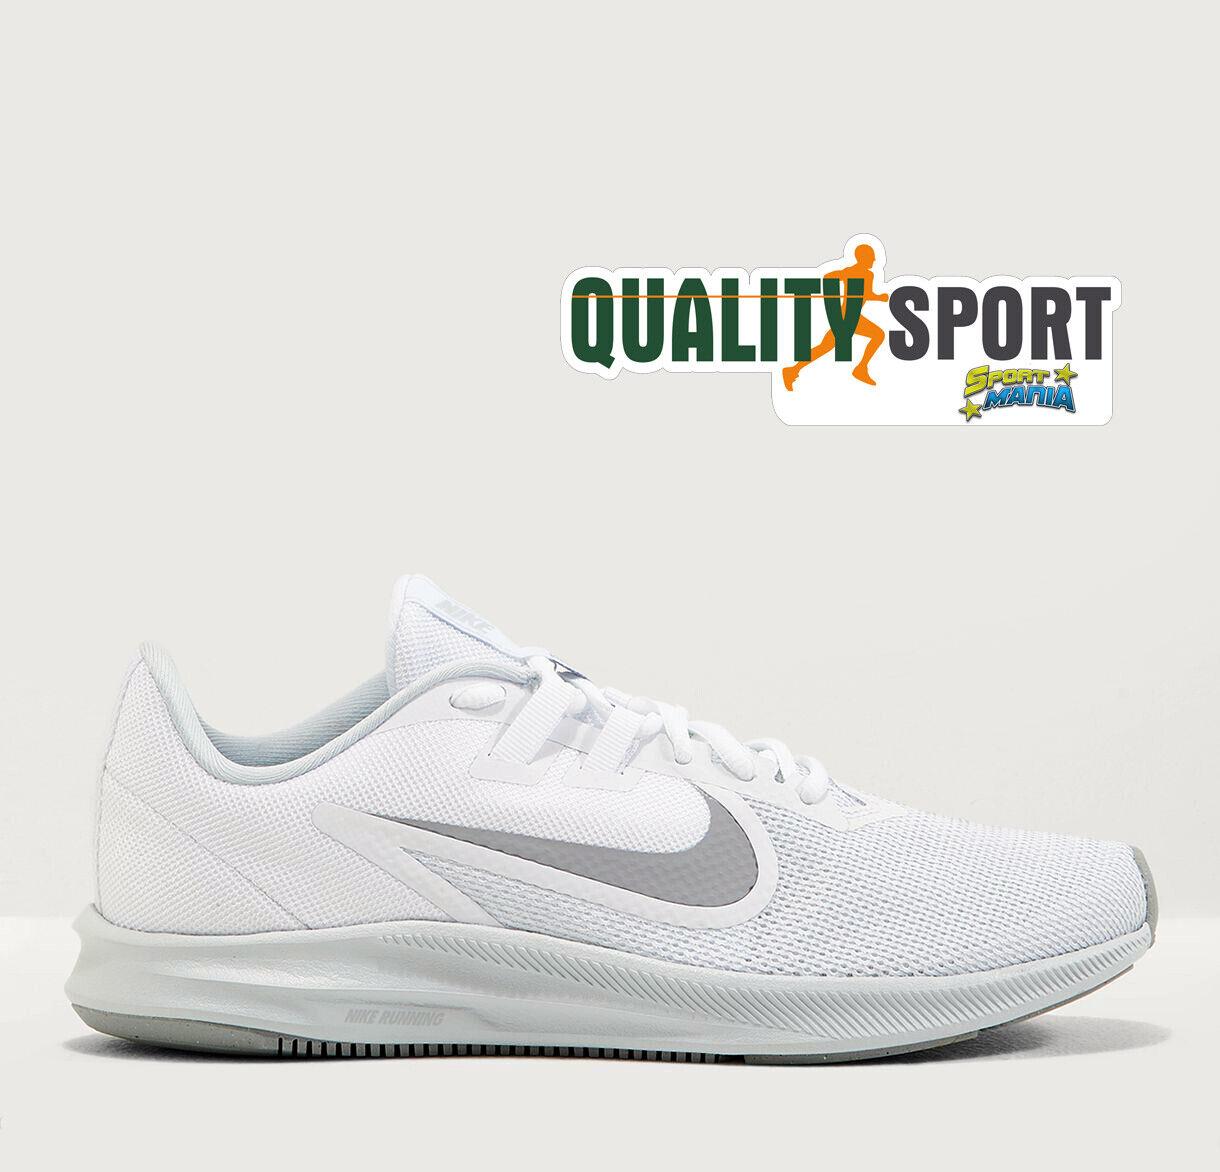 Nike Sport Schuhe Downshifter 9 Weiß Schuhe Frau Sport Running AQ7486 100 2019